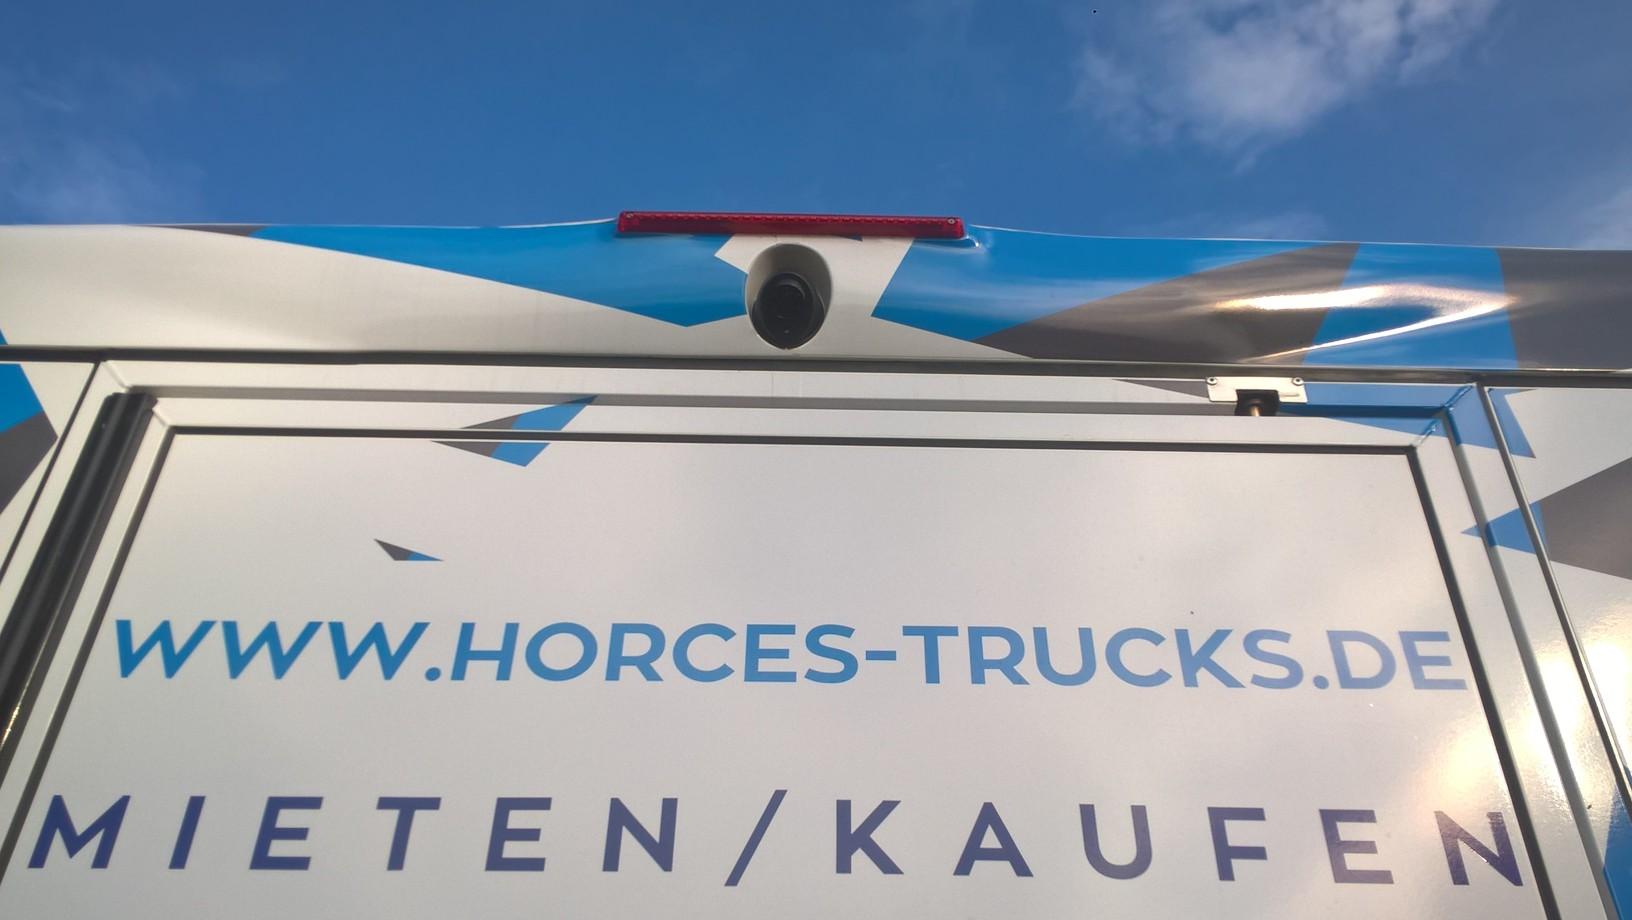 Paragan by horces-trucks.de